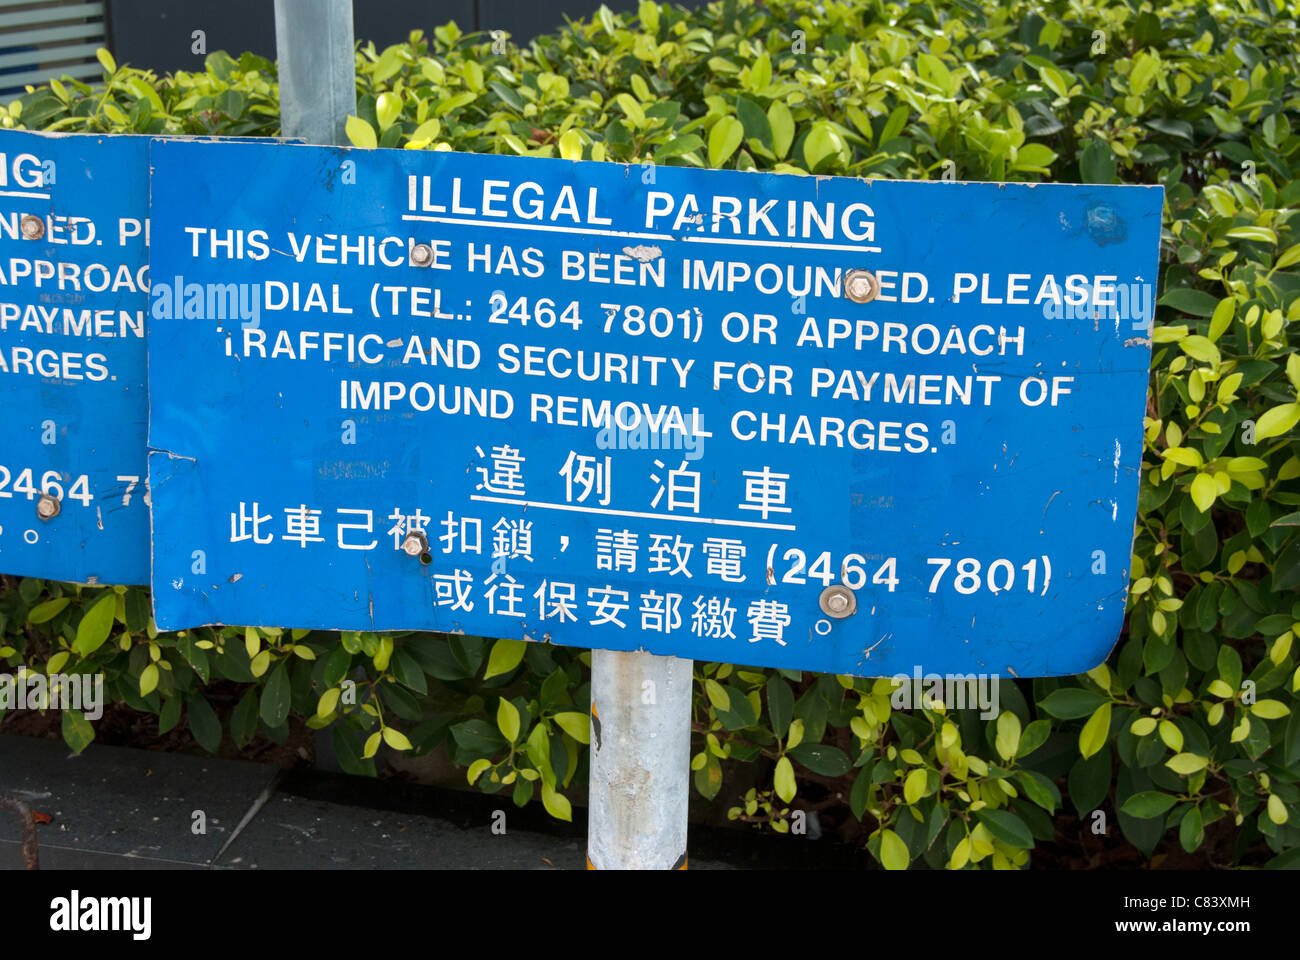 Illegal Parking Signs, Hong Kong - Stock Image